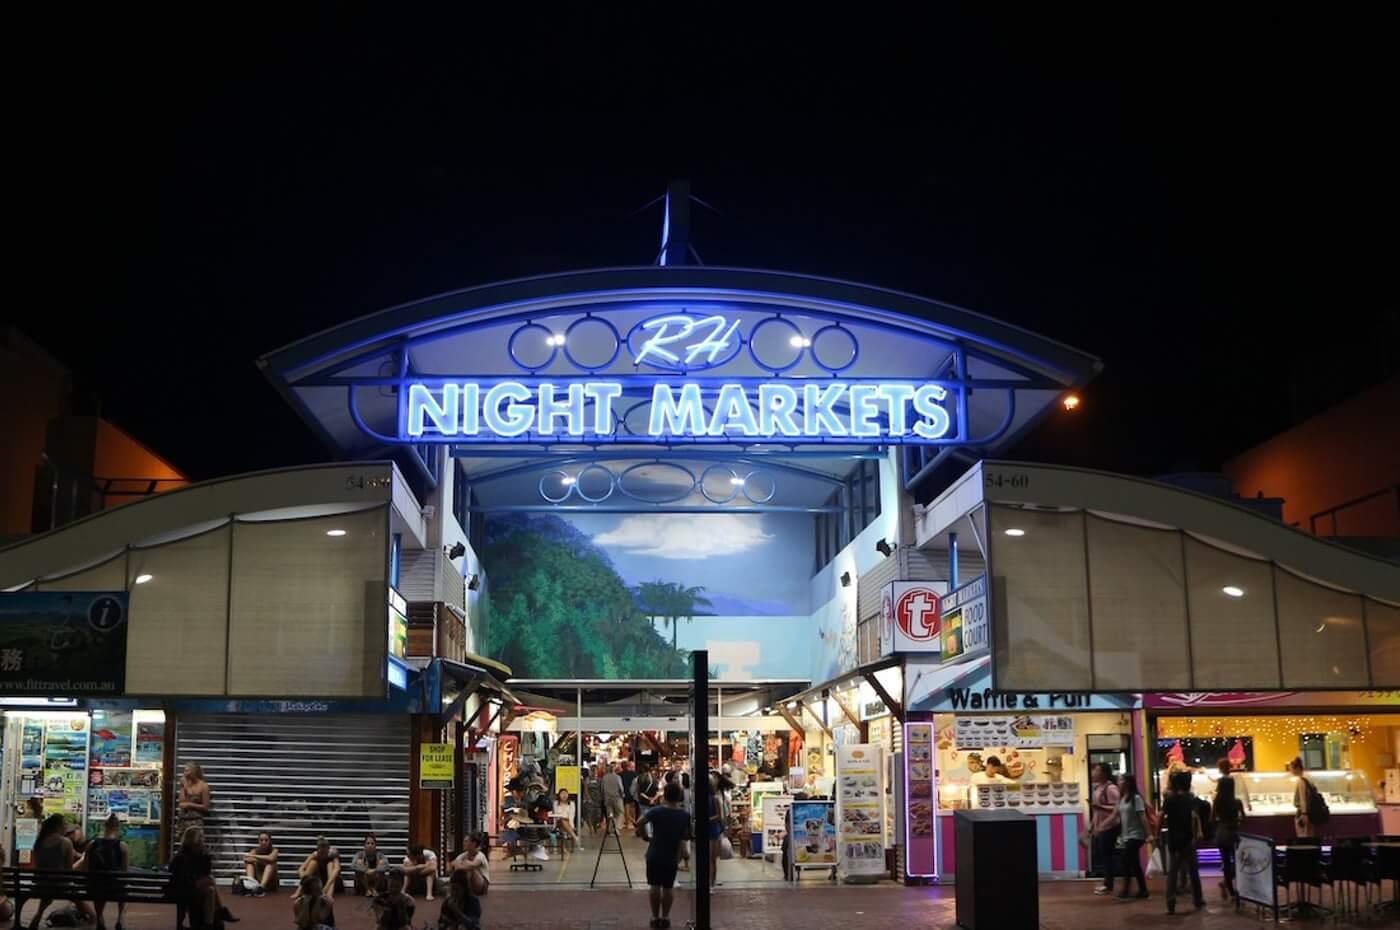 cairns night market, cairns food market, cairns asplonade